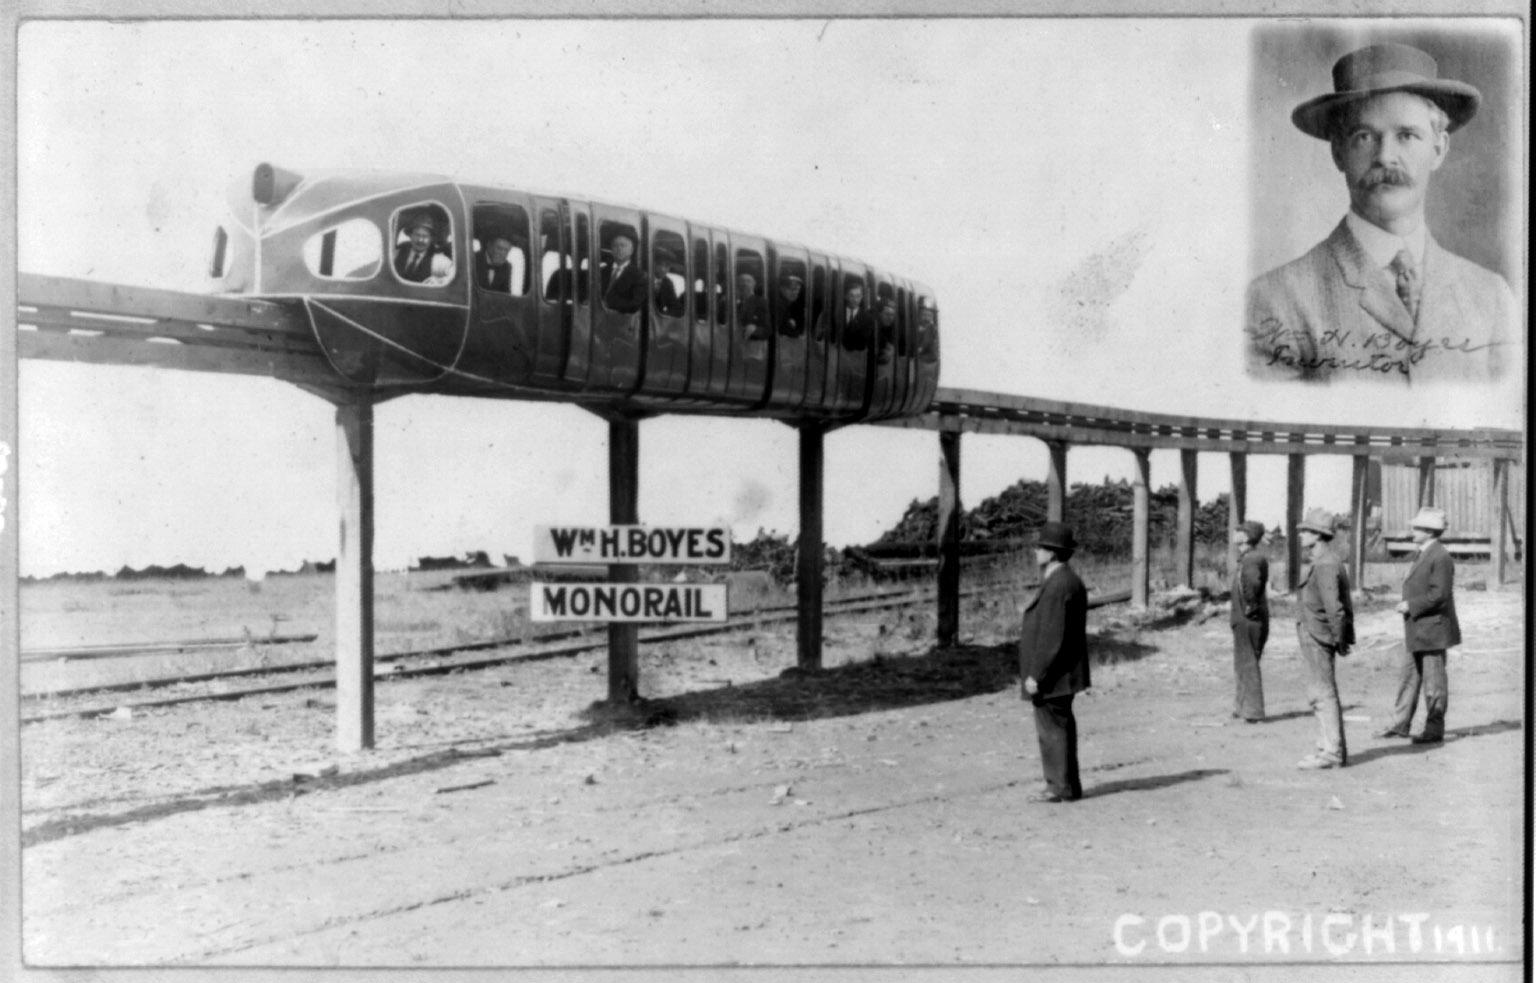 wm h boyes monorail 1911 paleo-future.jpg